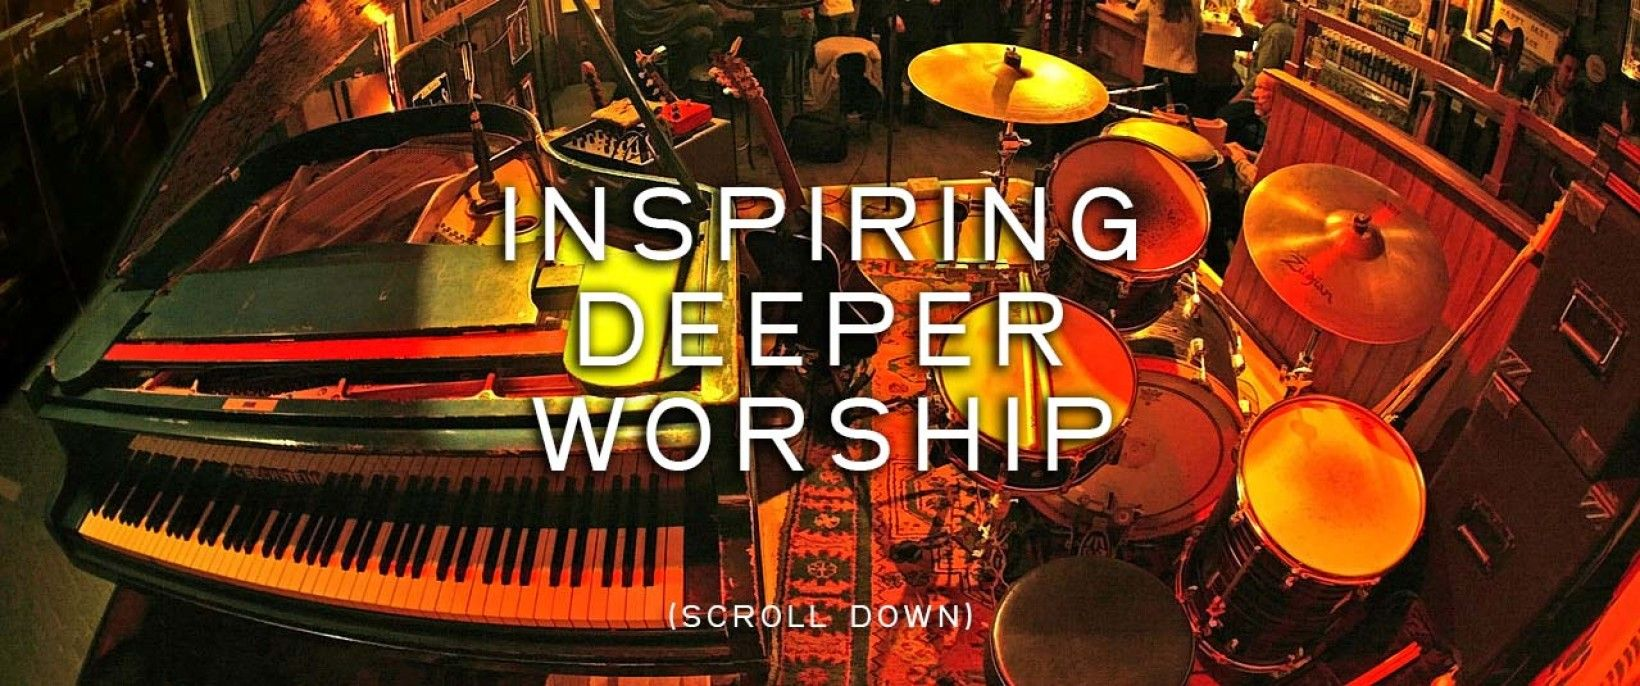 Worship Deeper  